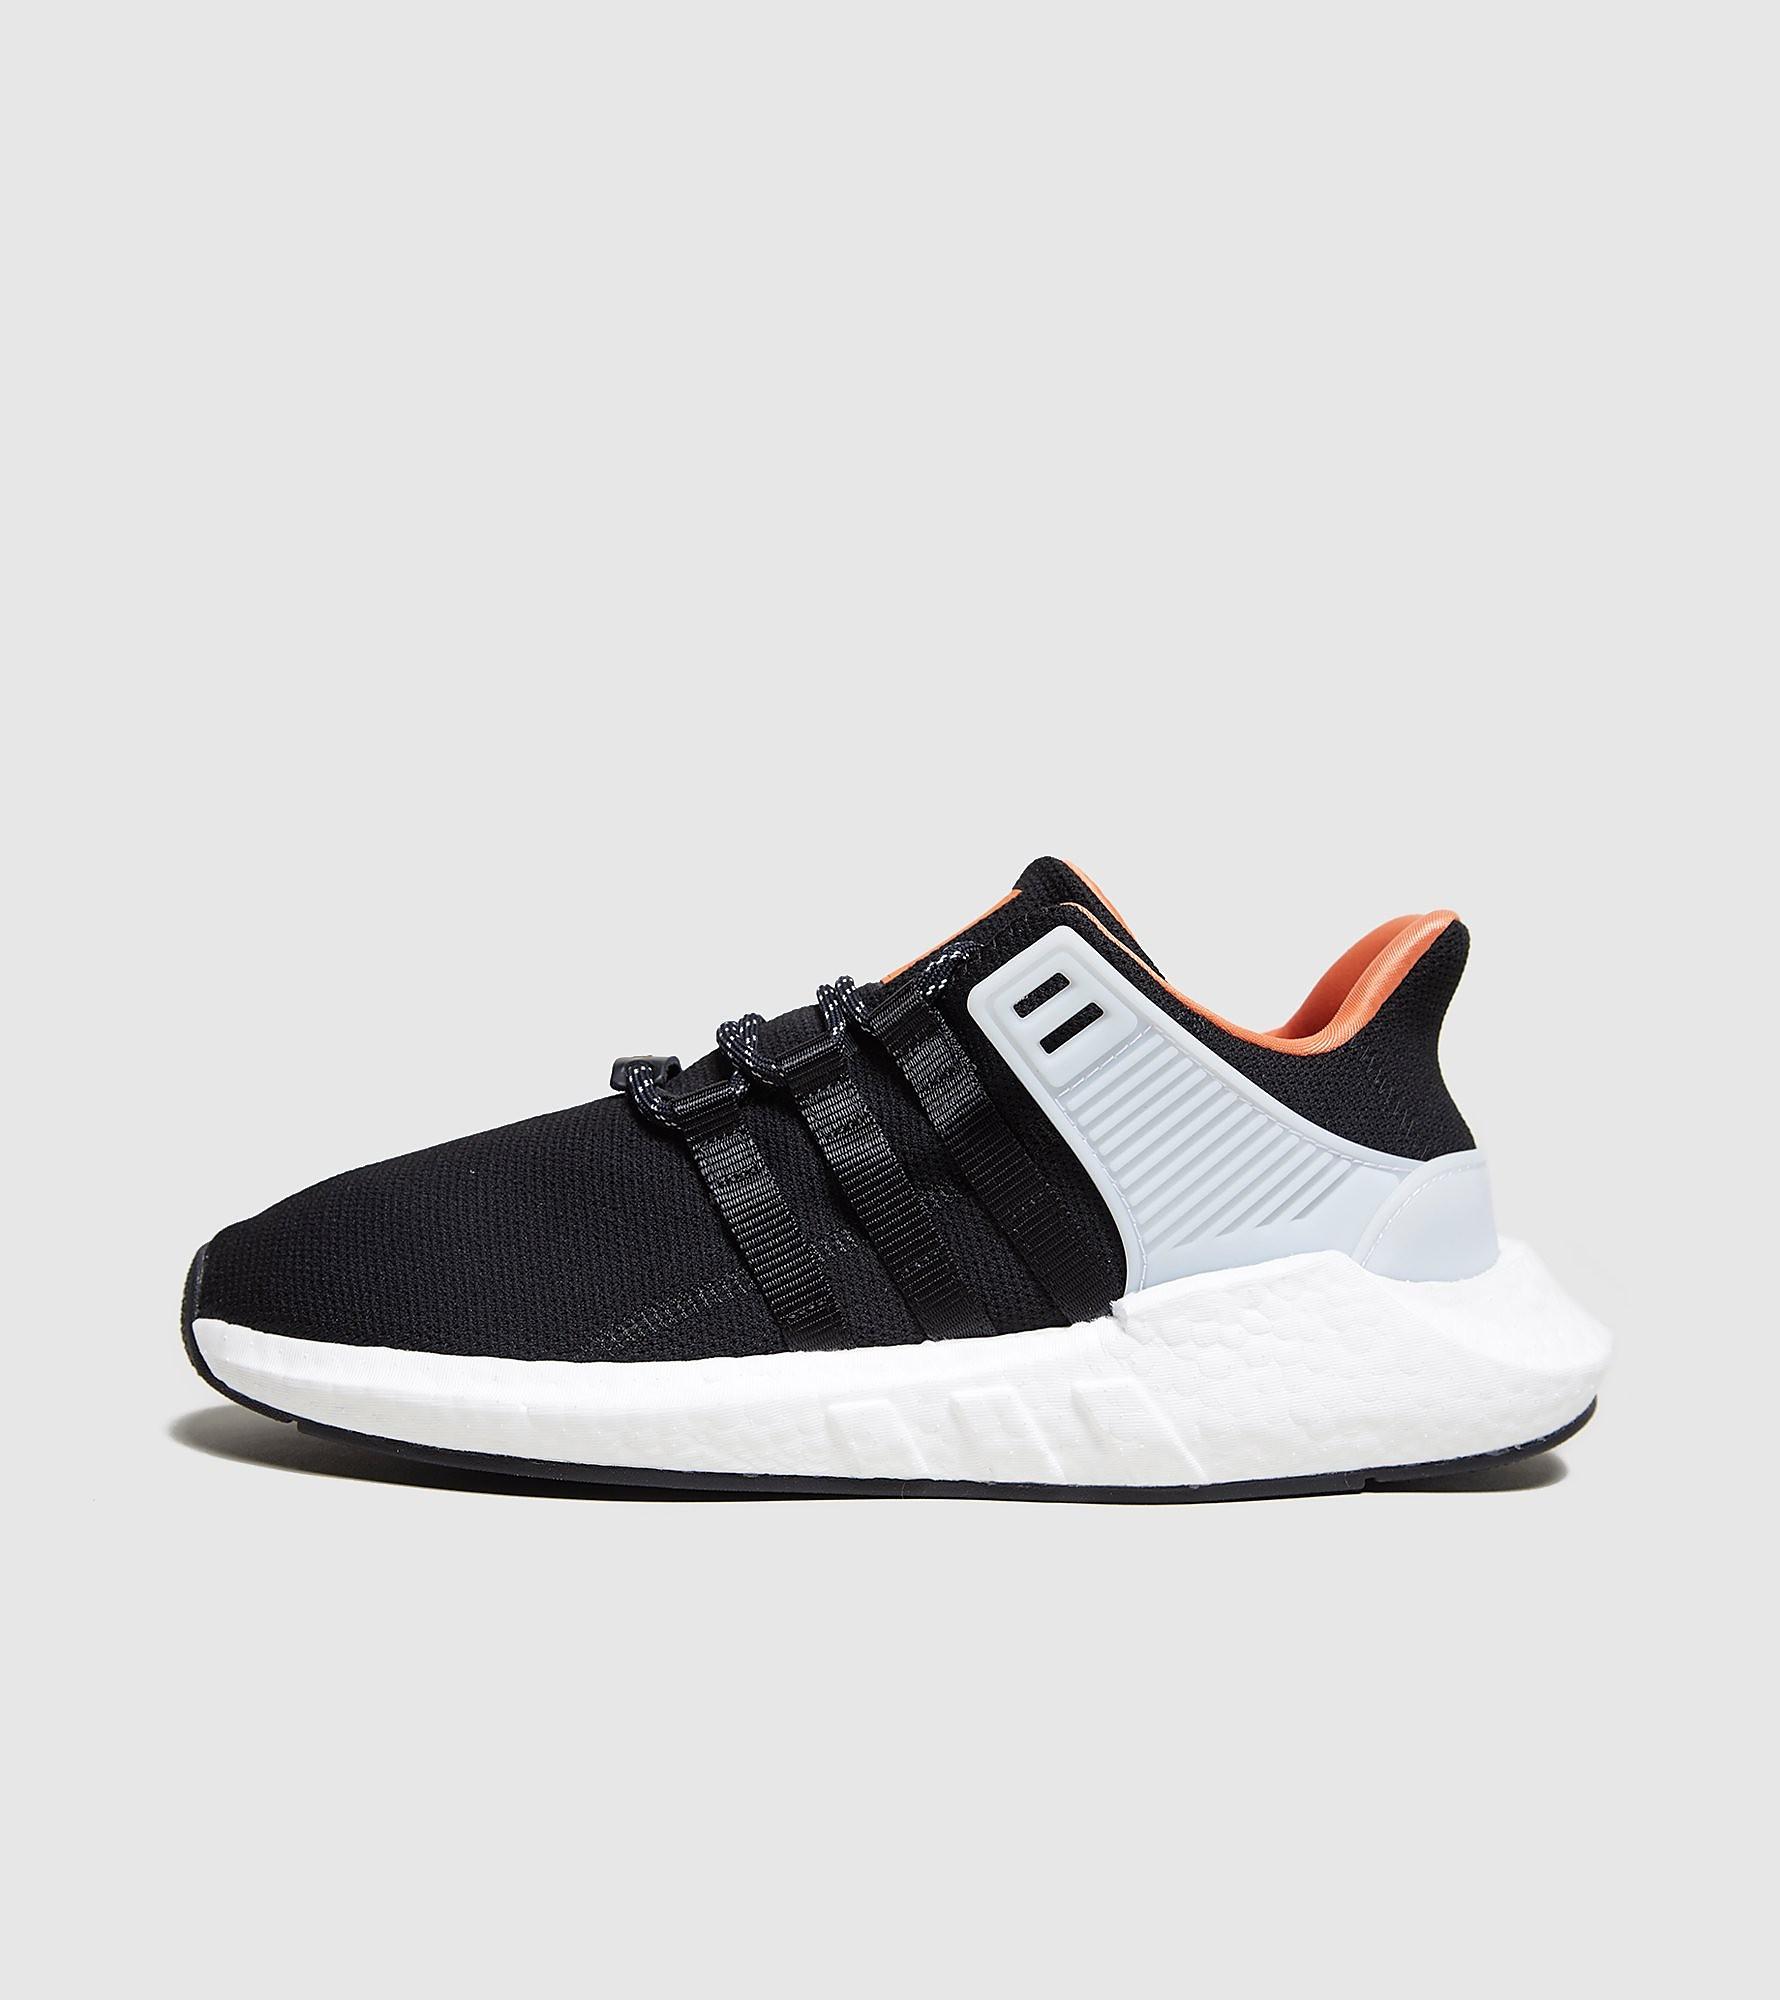 premium selection 66052 f25b0 ... The sale of shoes adidas Originals EQT Support 9317 ...